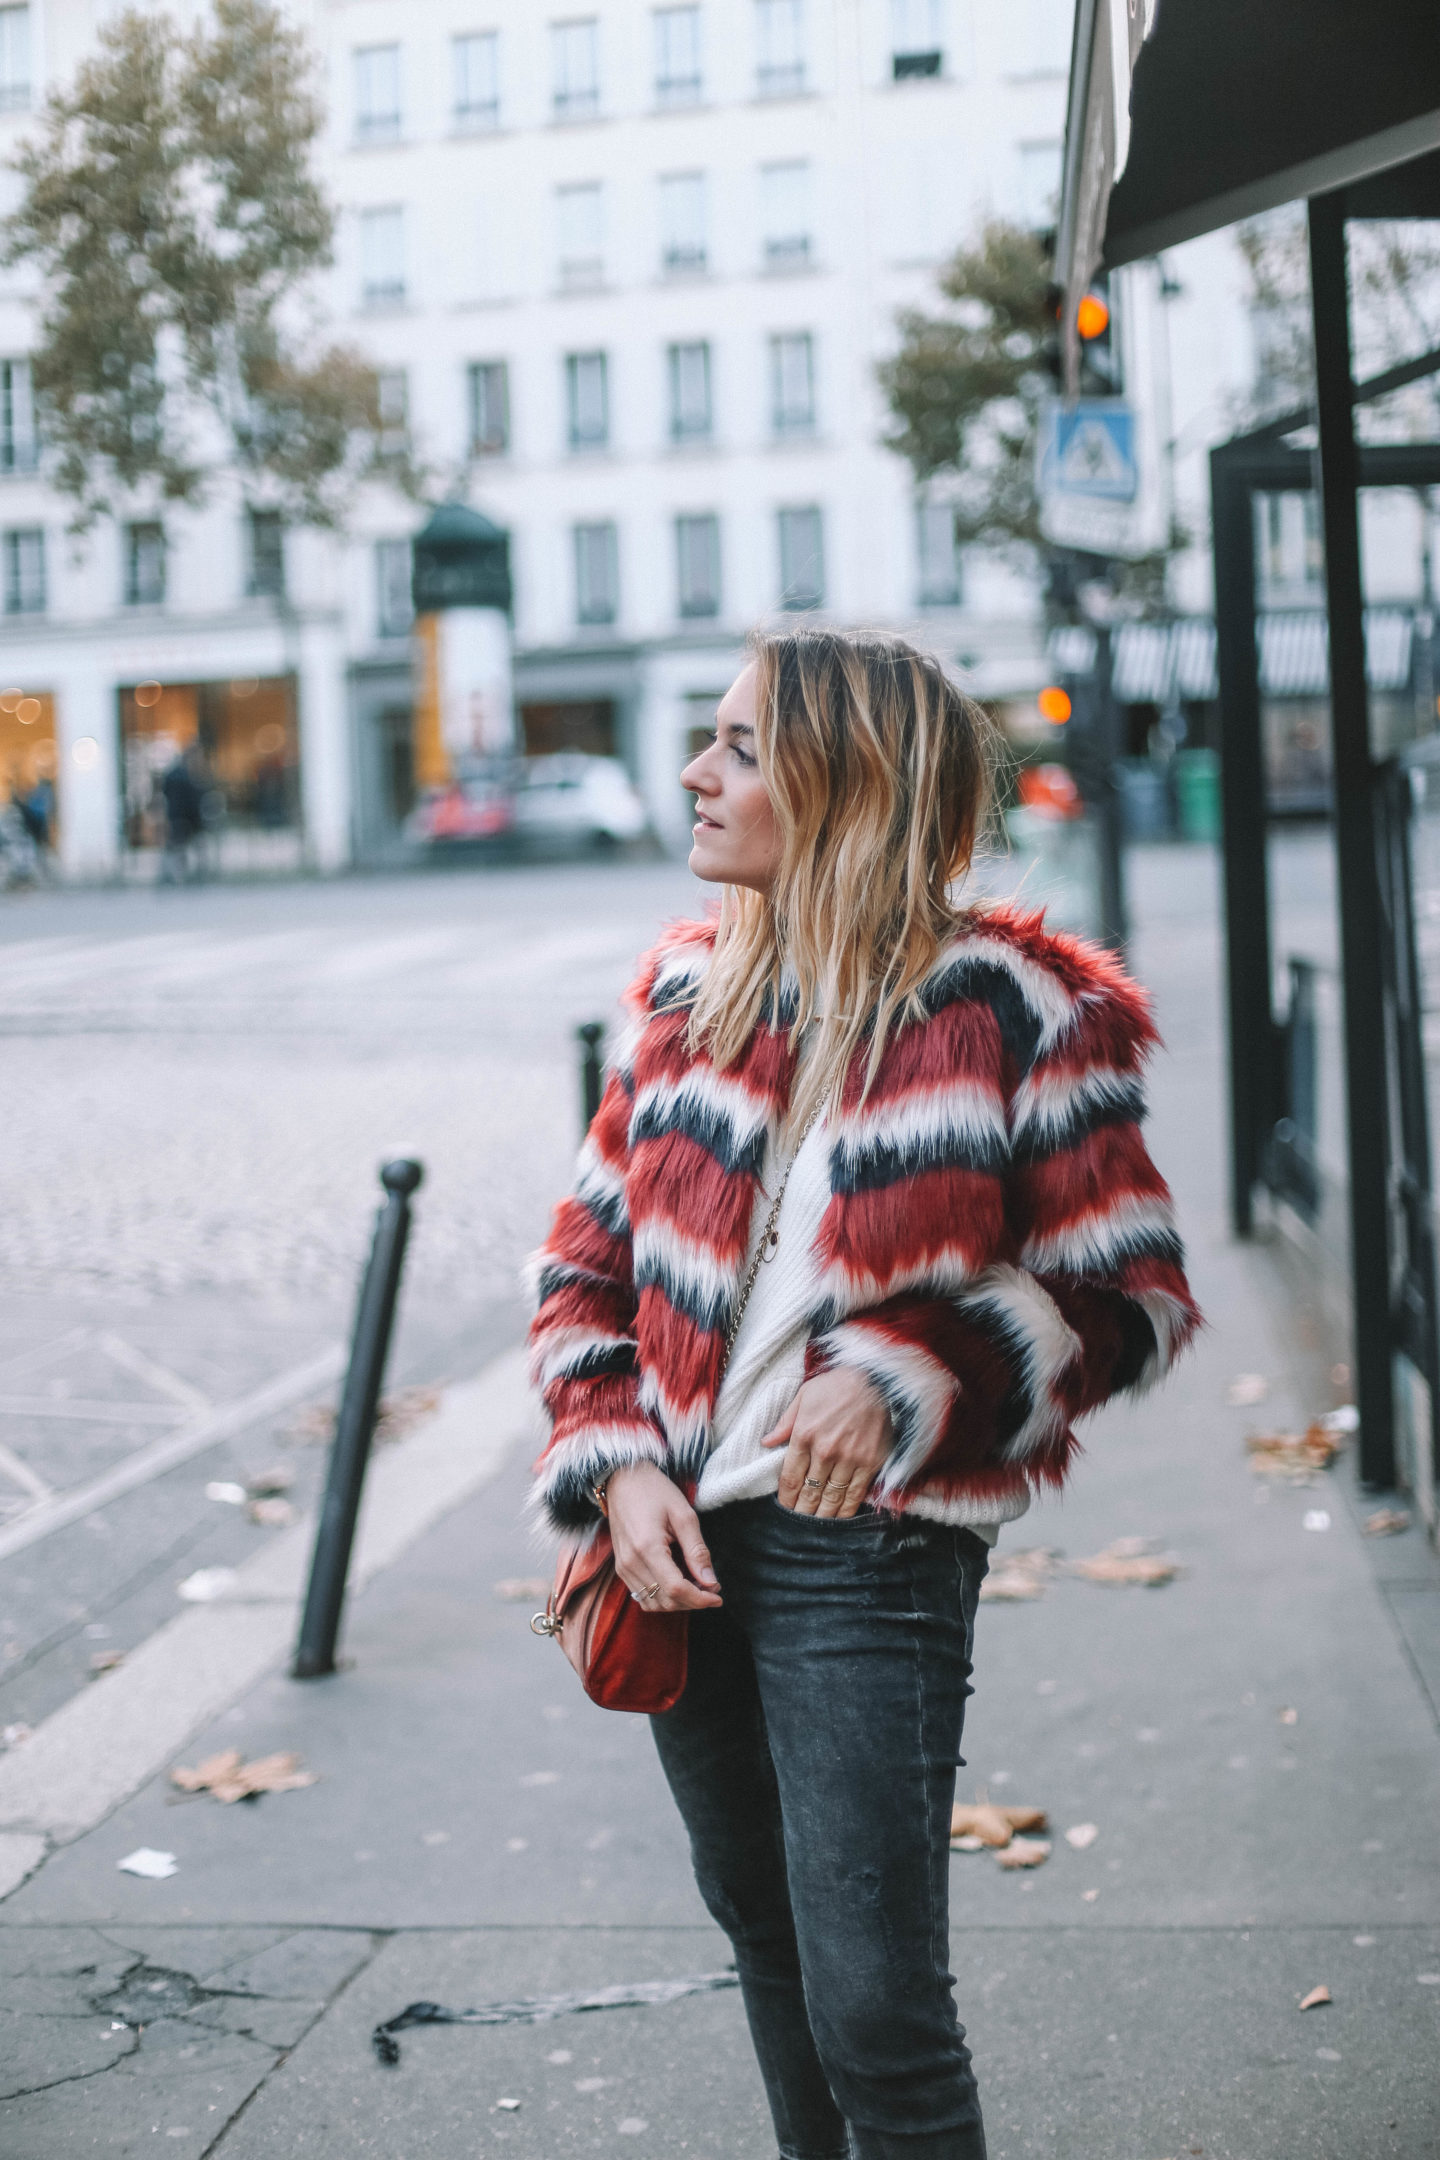 Manteaux Revolve Clothing - Blondie Baby blog mode et voyages